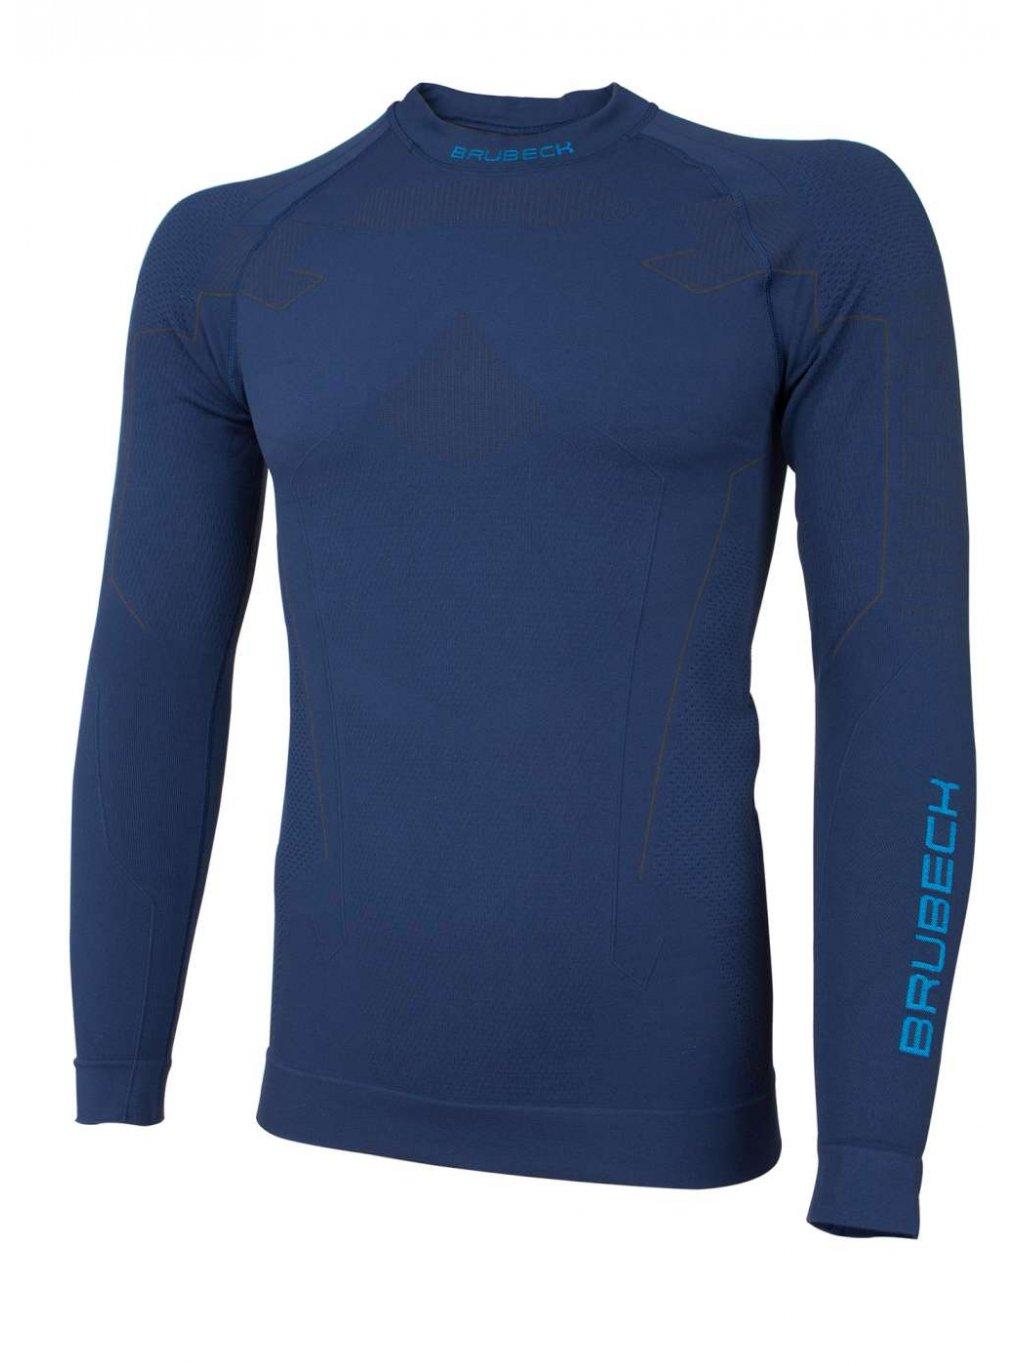 Brubeck pánské tričko s dlouhým rukávem Thermo